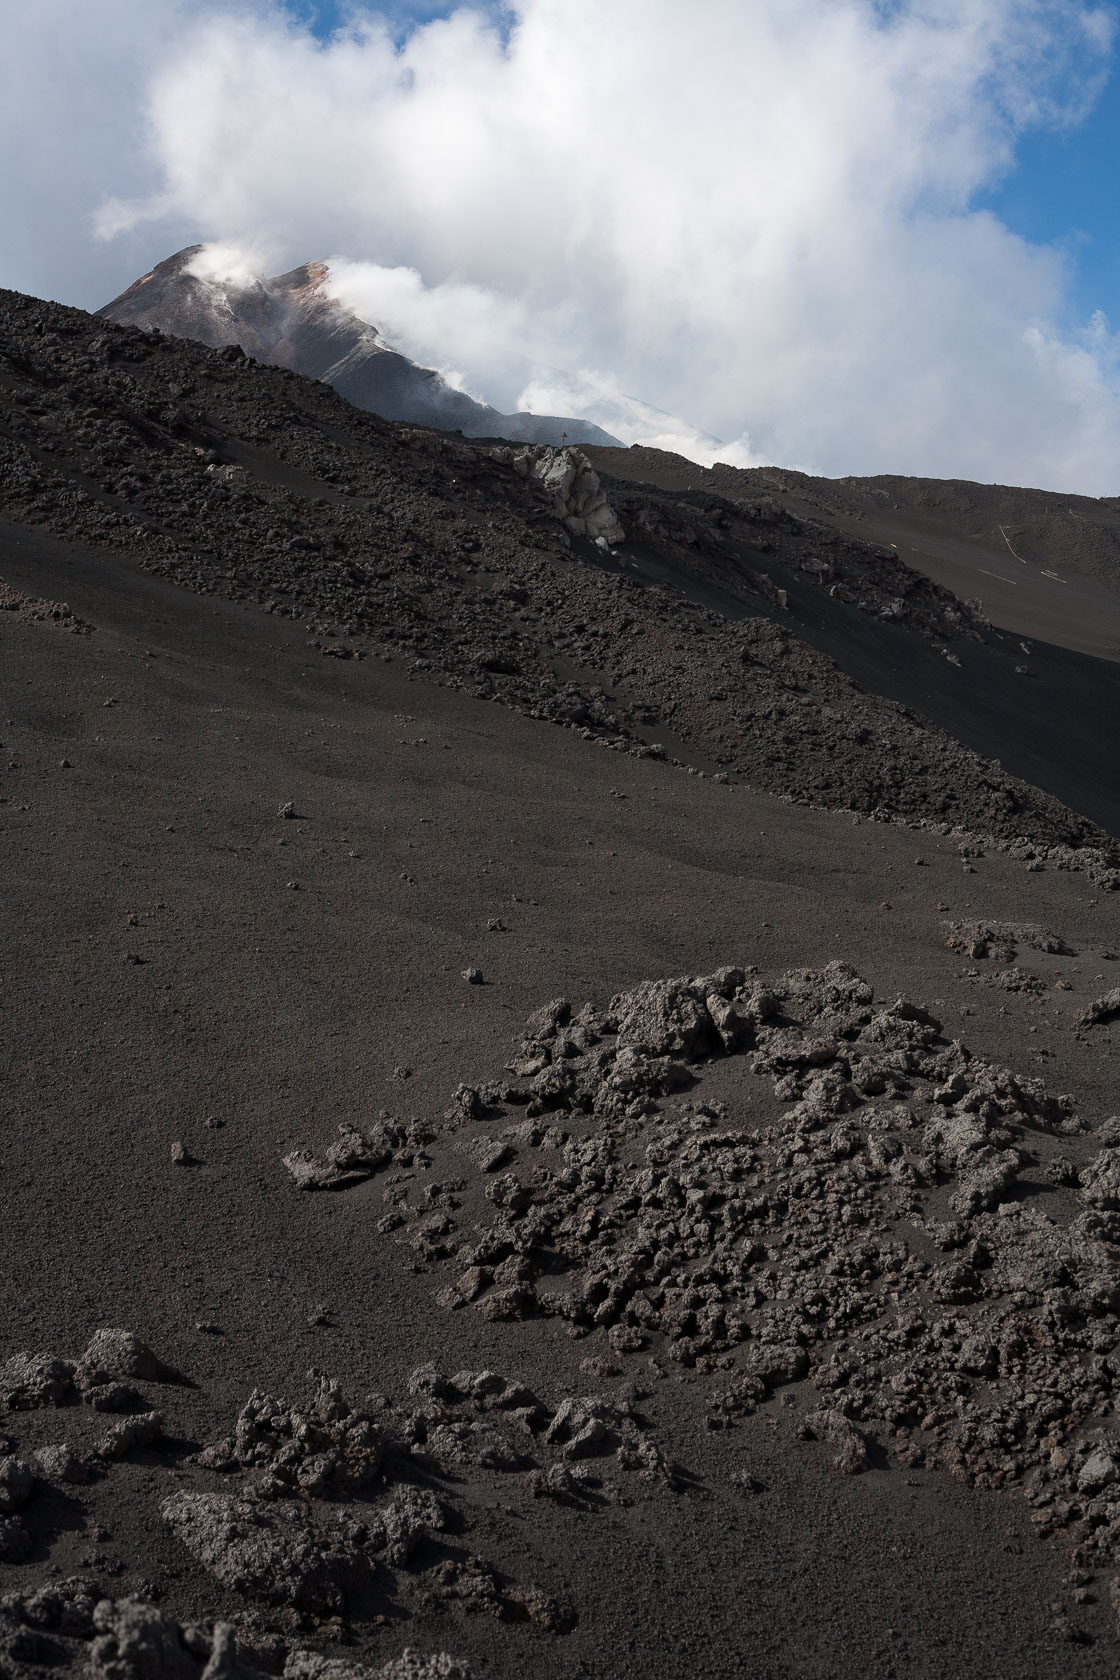 L'un des sommets du volcan Etna en sicile